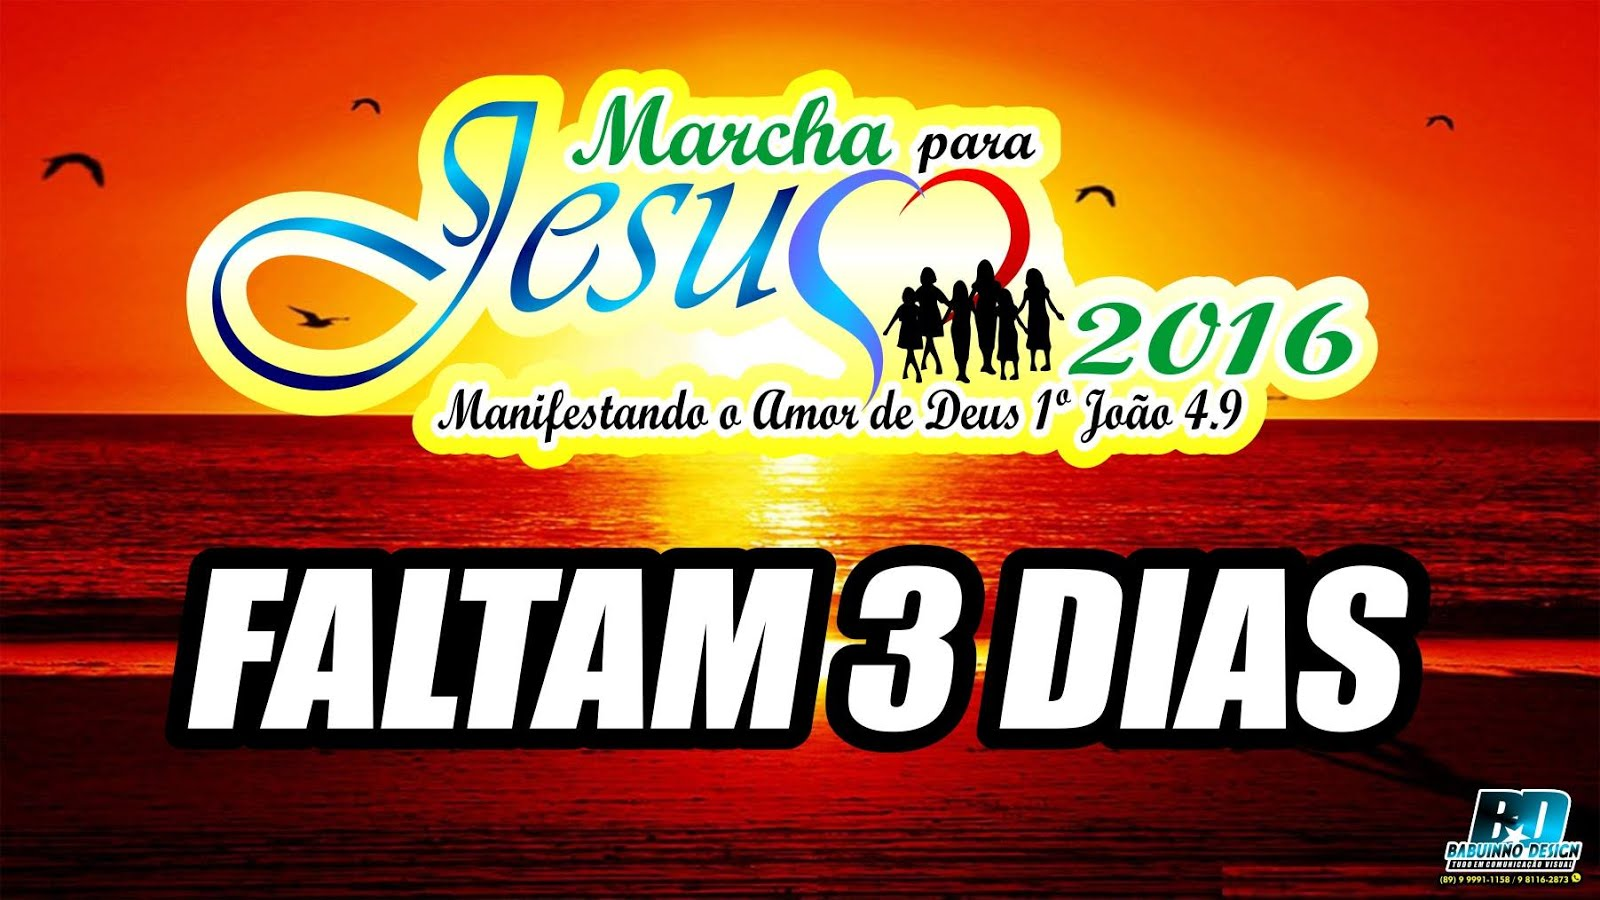 Marcha para Jesus de Bom Jesus, dia 13/08/2016